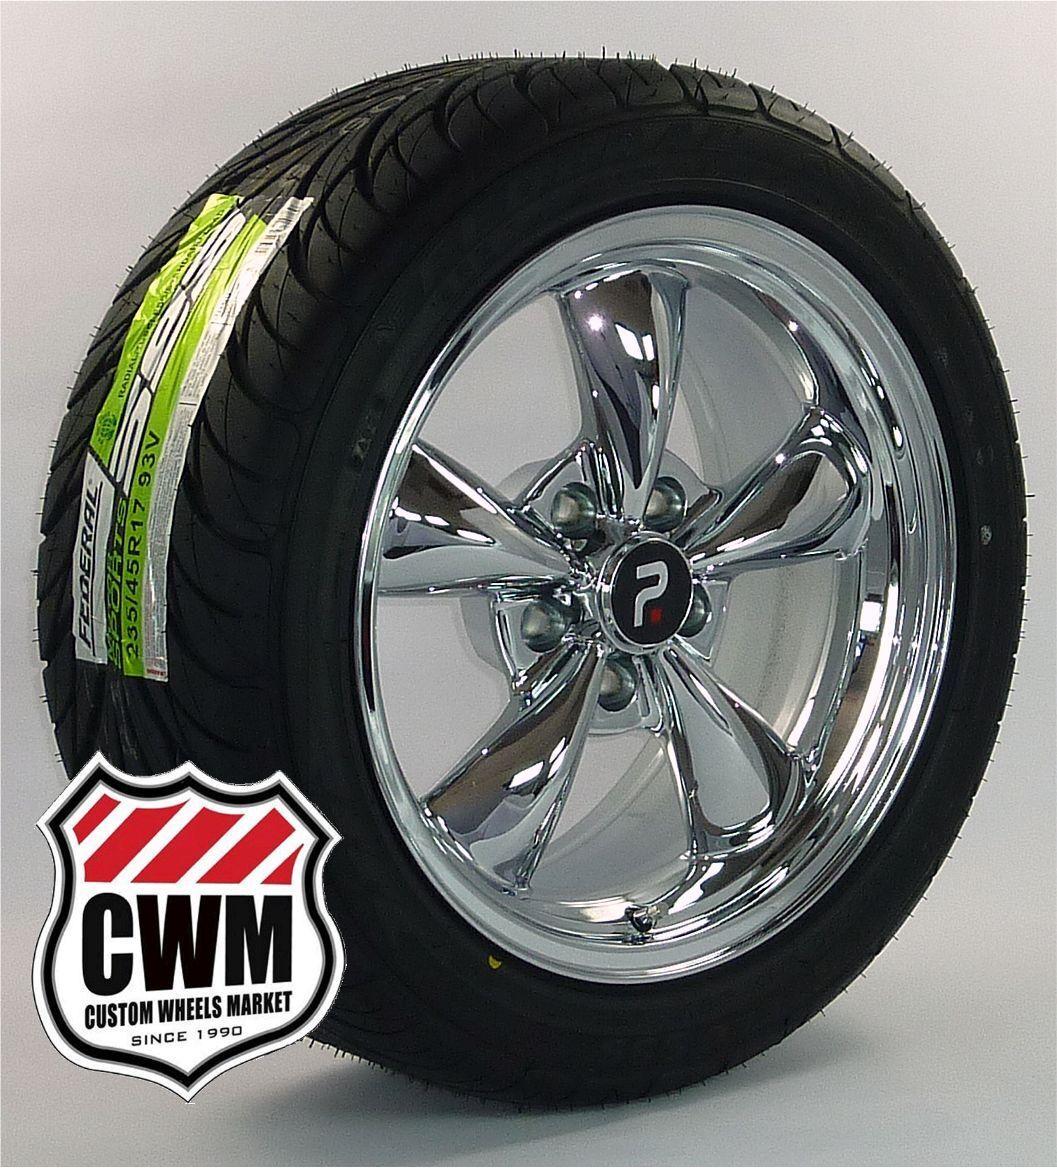 Chrome Wheels Rims Federal Tires for Chevy El Camino 66 81